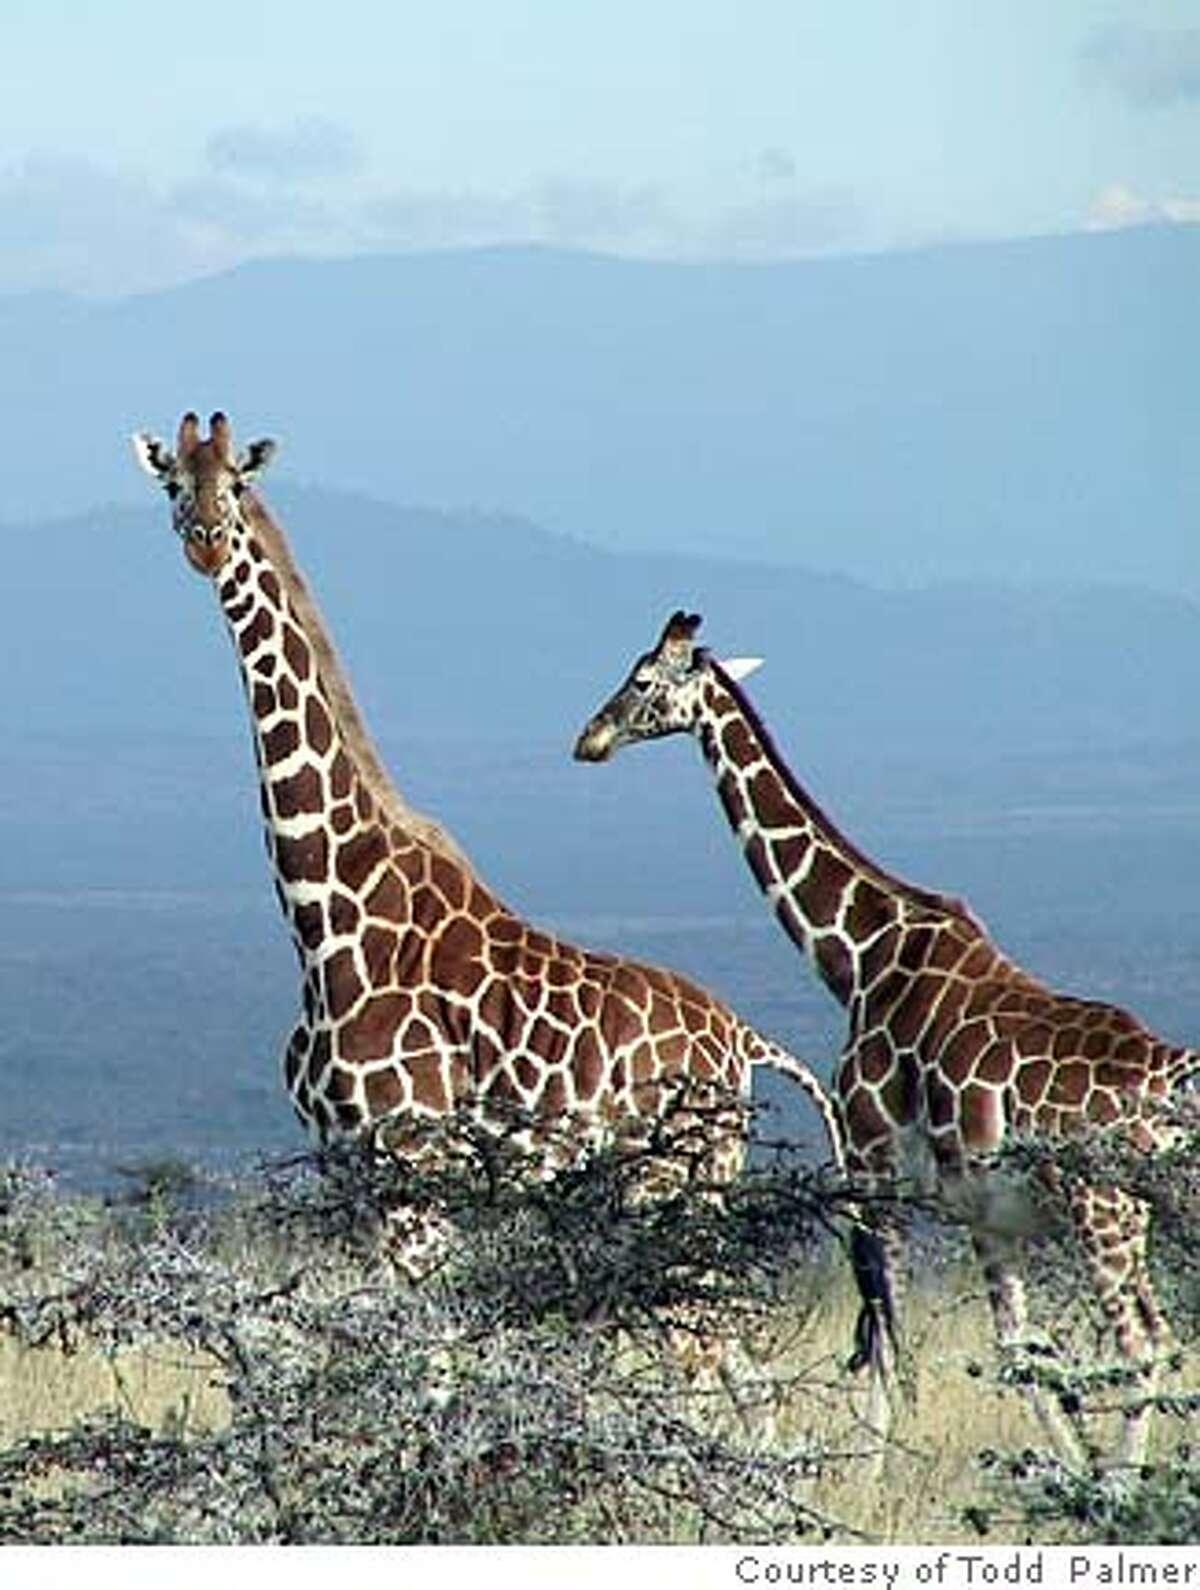 Giraffes around the ant-plant, Acacia drepanolobium. [Image courtesy of Todd Palmer]